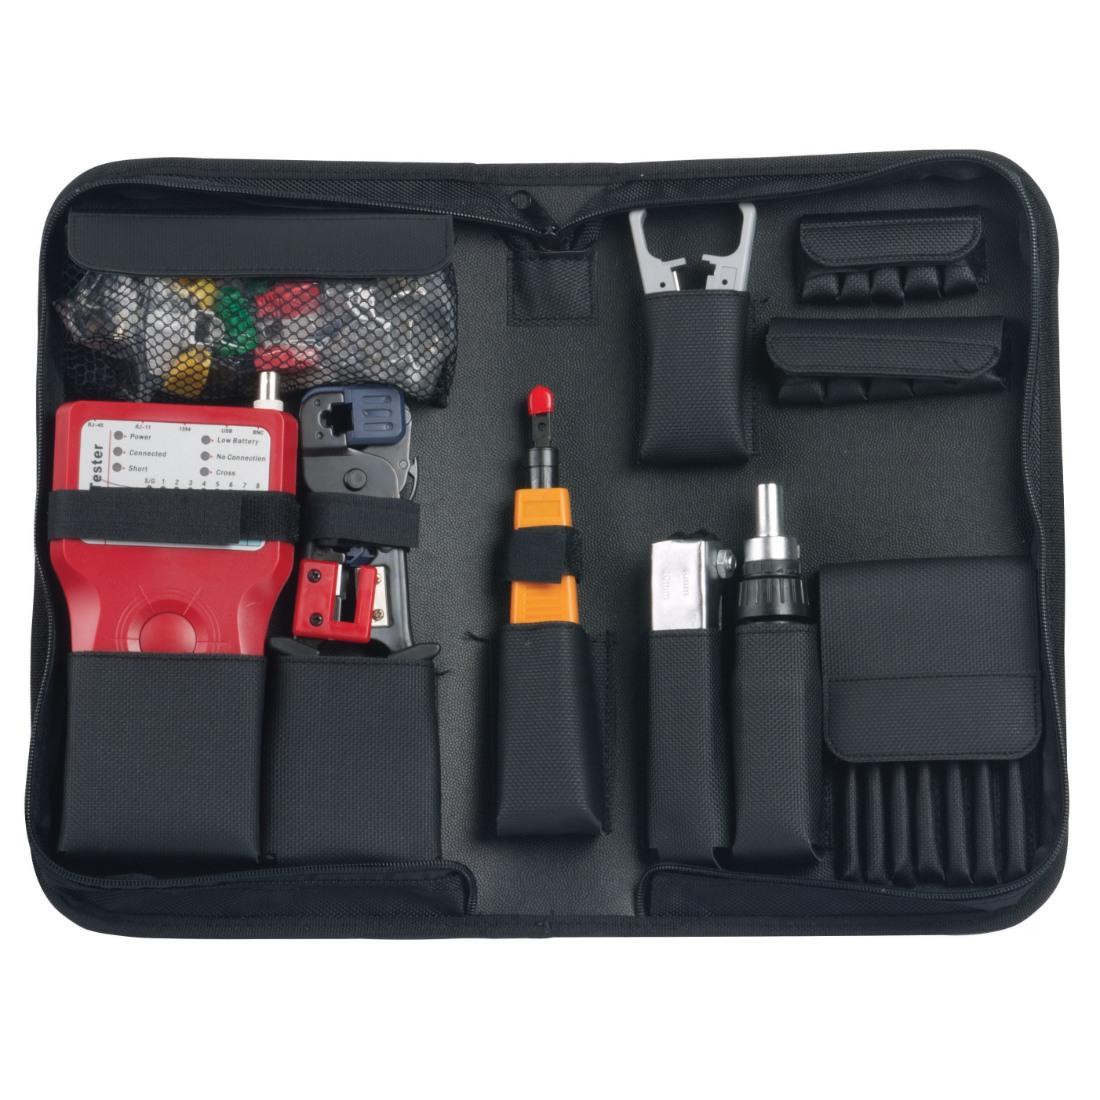 Philex Lan Installation Tool Kit Philex Electronics Ltd